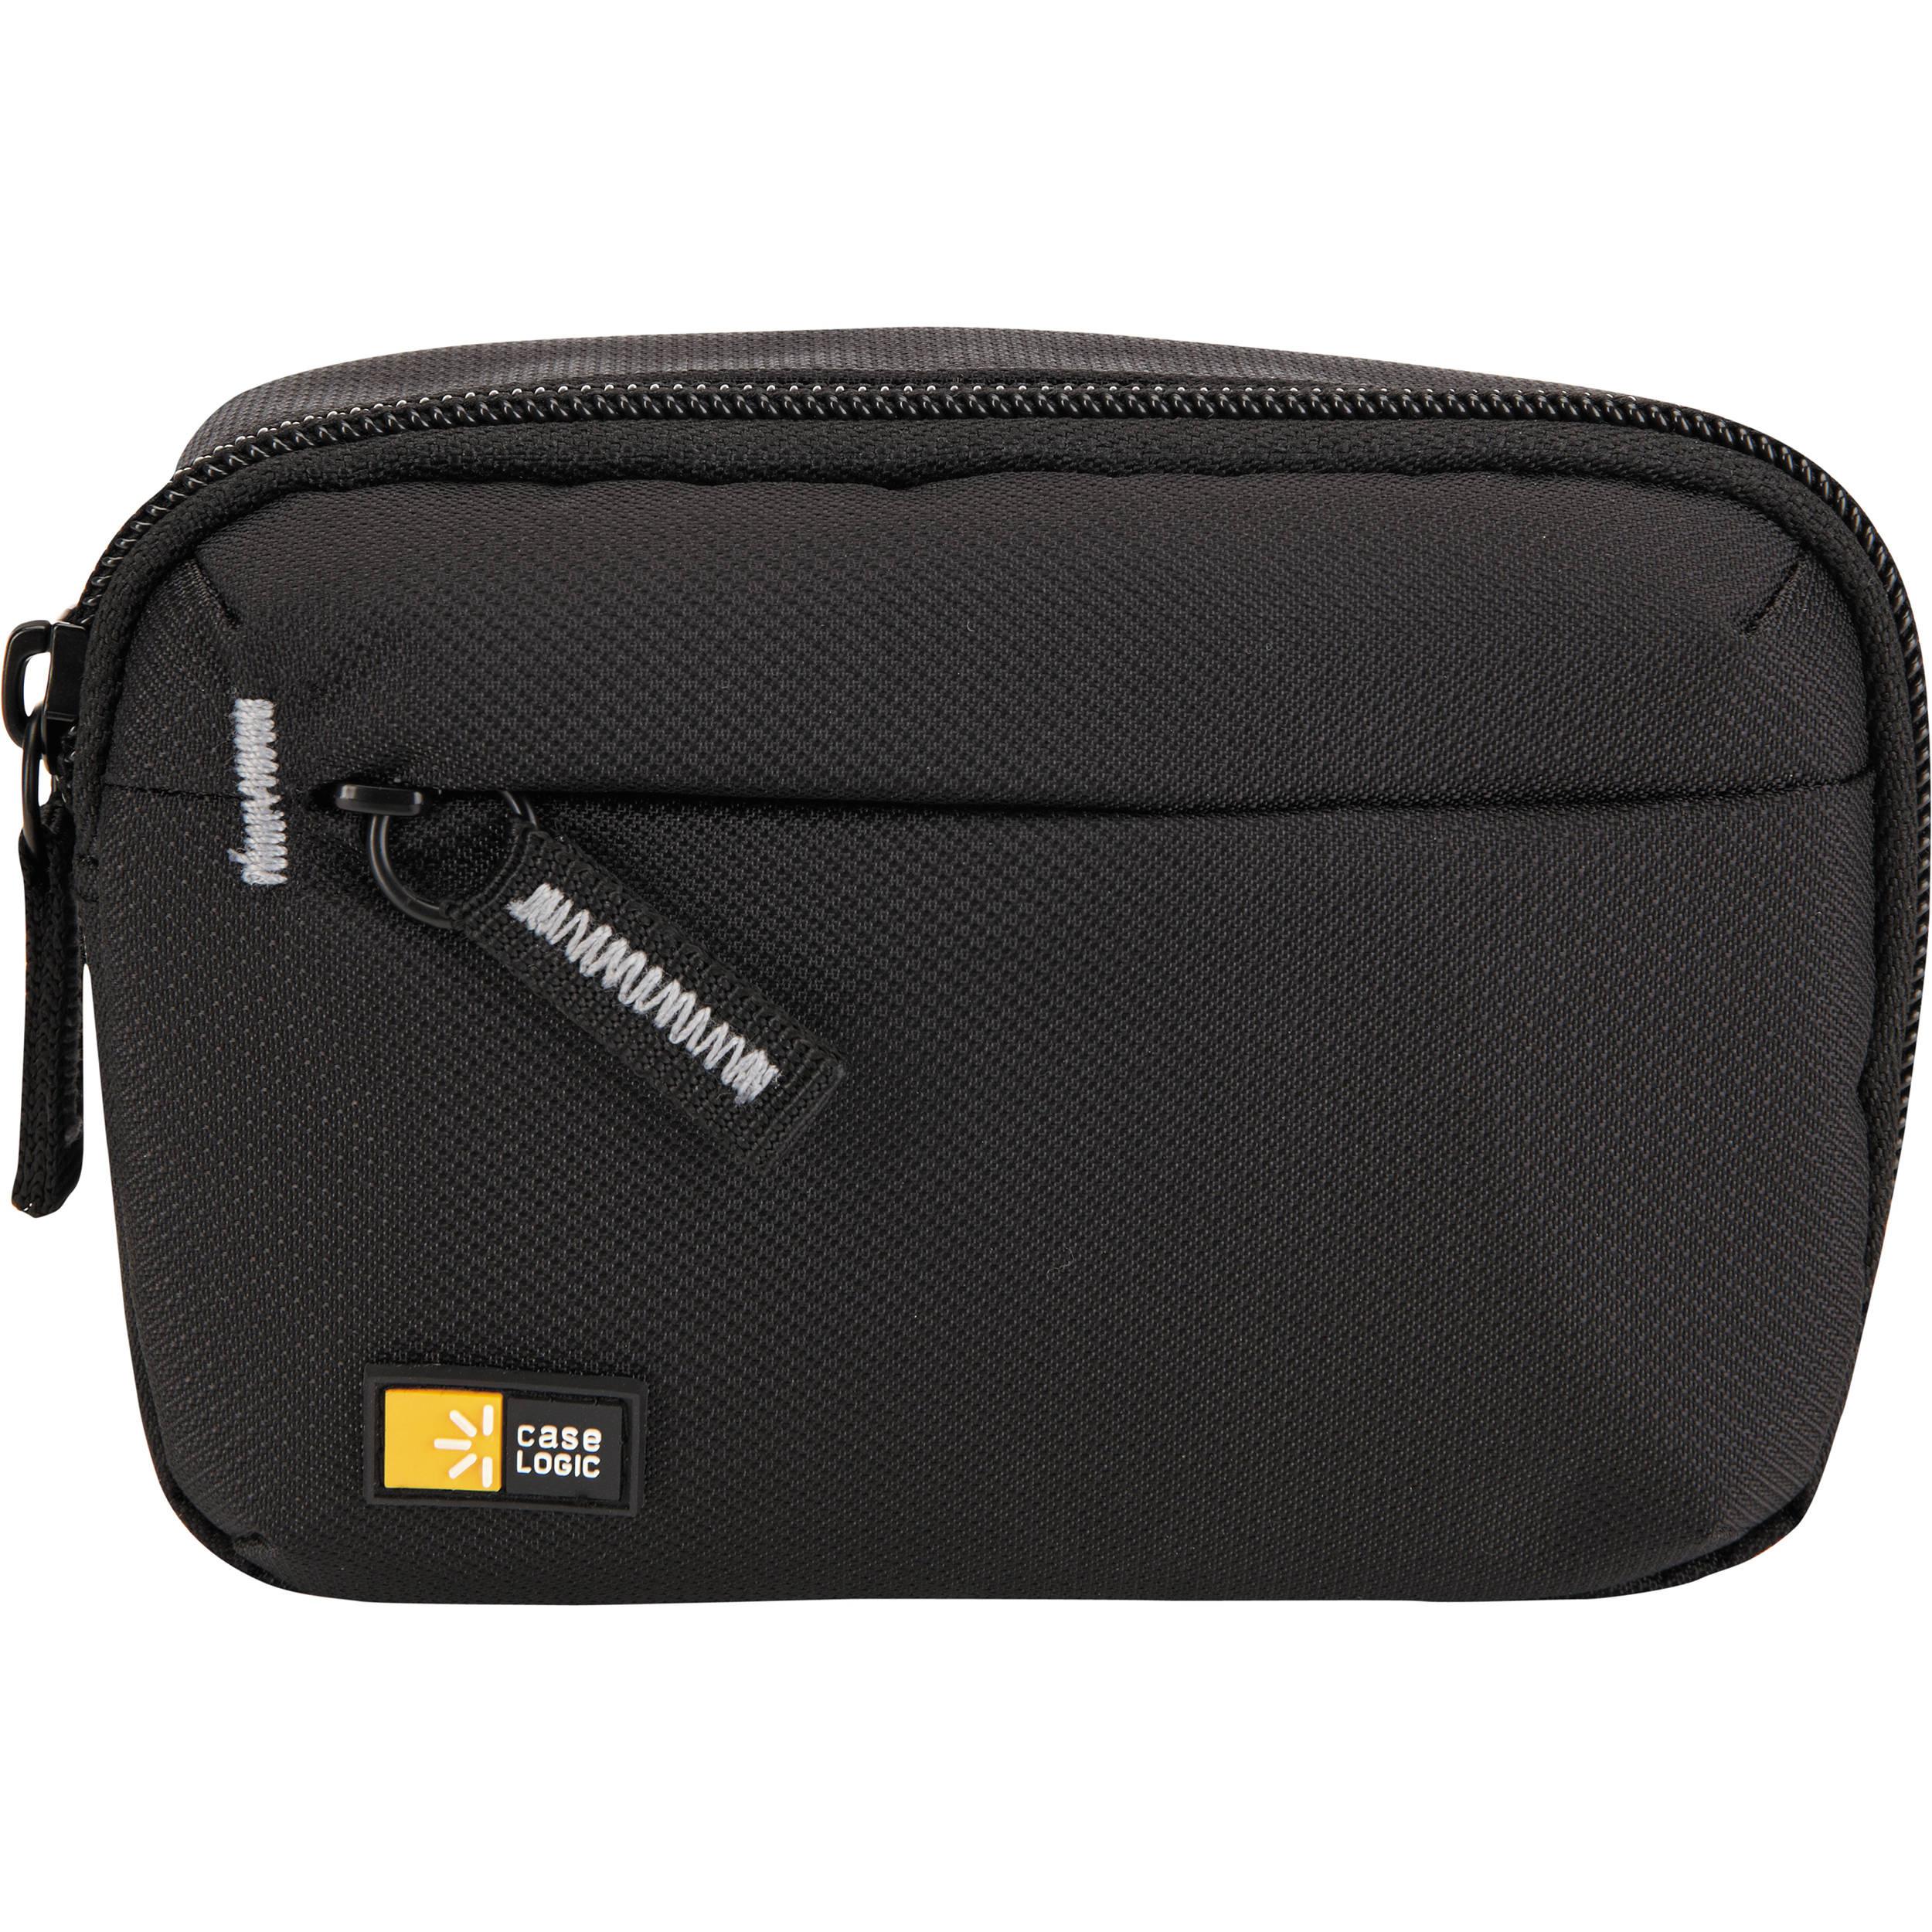 Case Logic TBC-403 Medium Camera Case (Black)